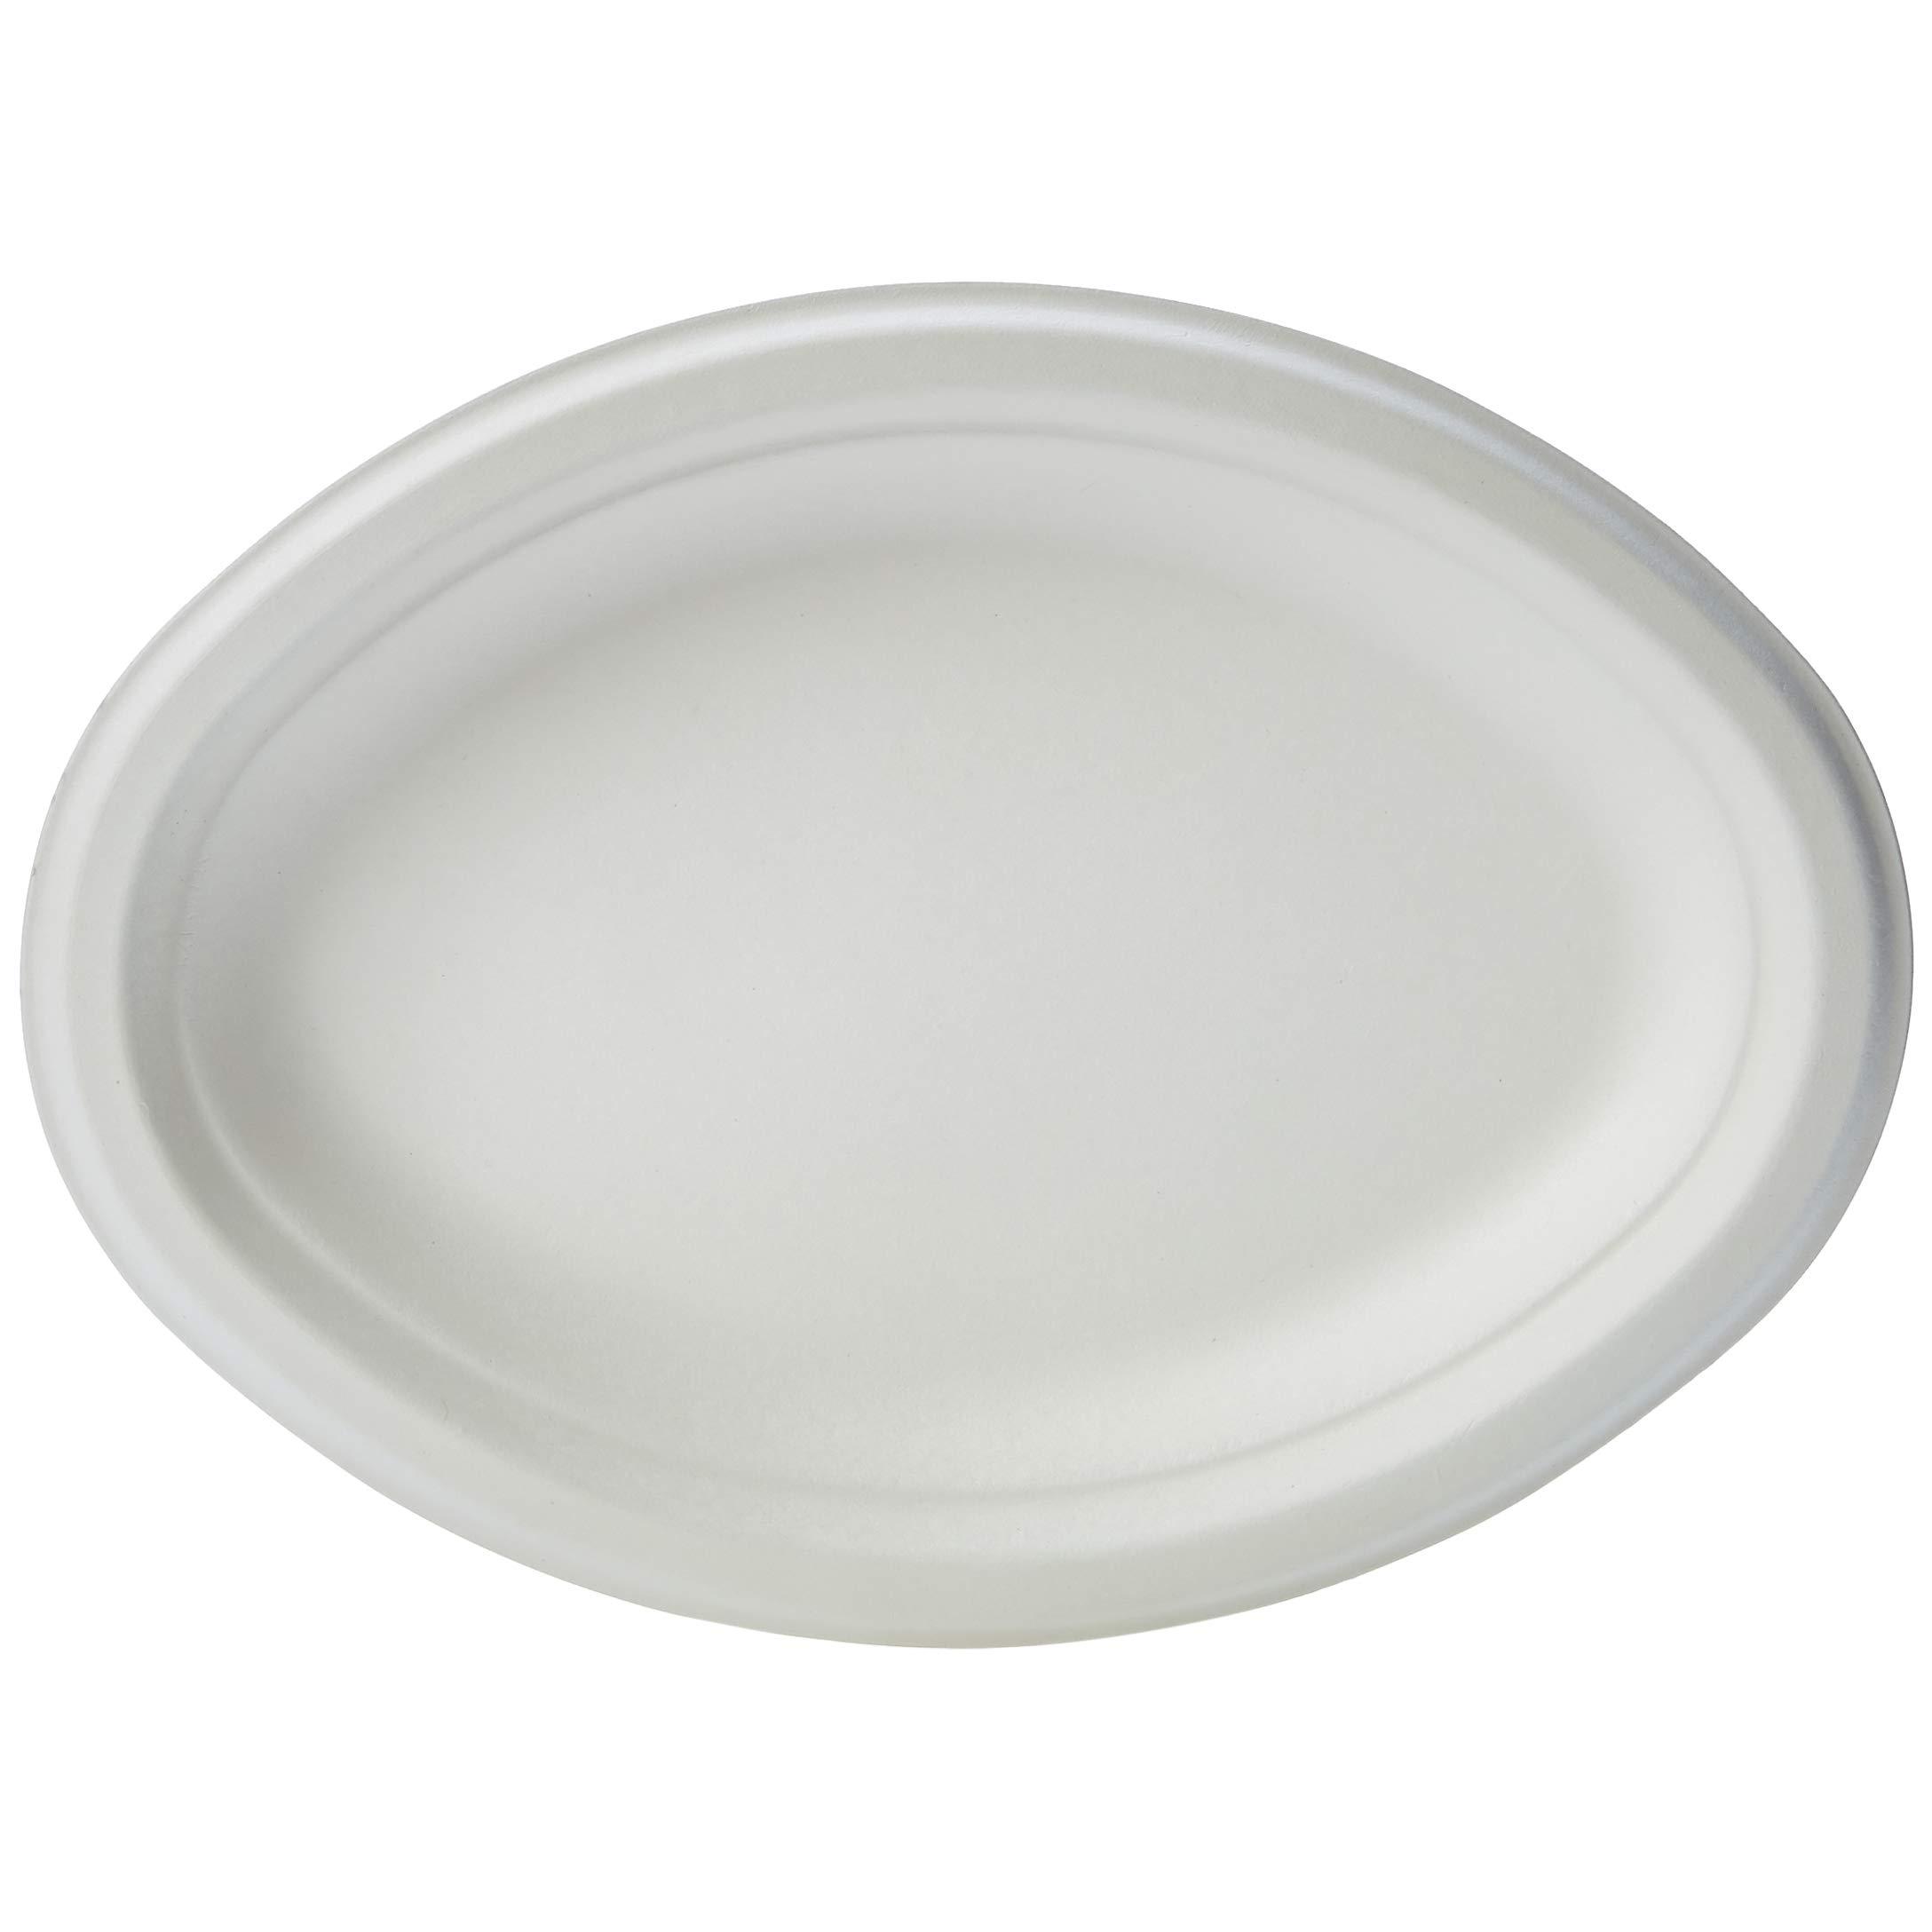 "AmazonBasics Compostable Plates, 10"" x 7.5"", Pack of 500"